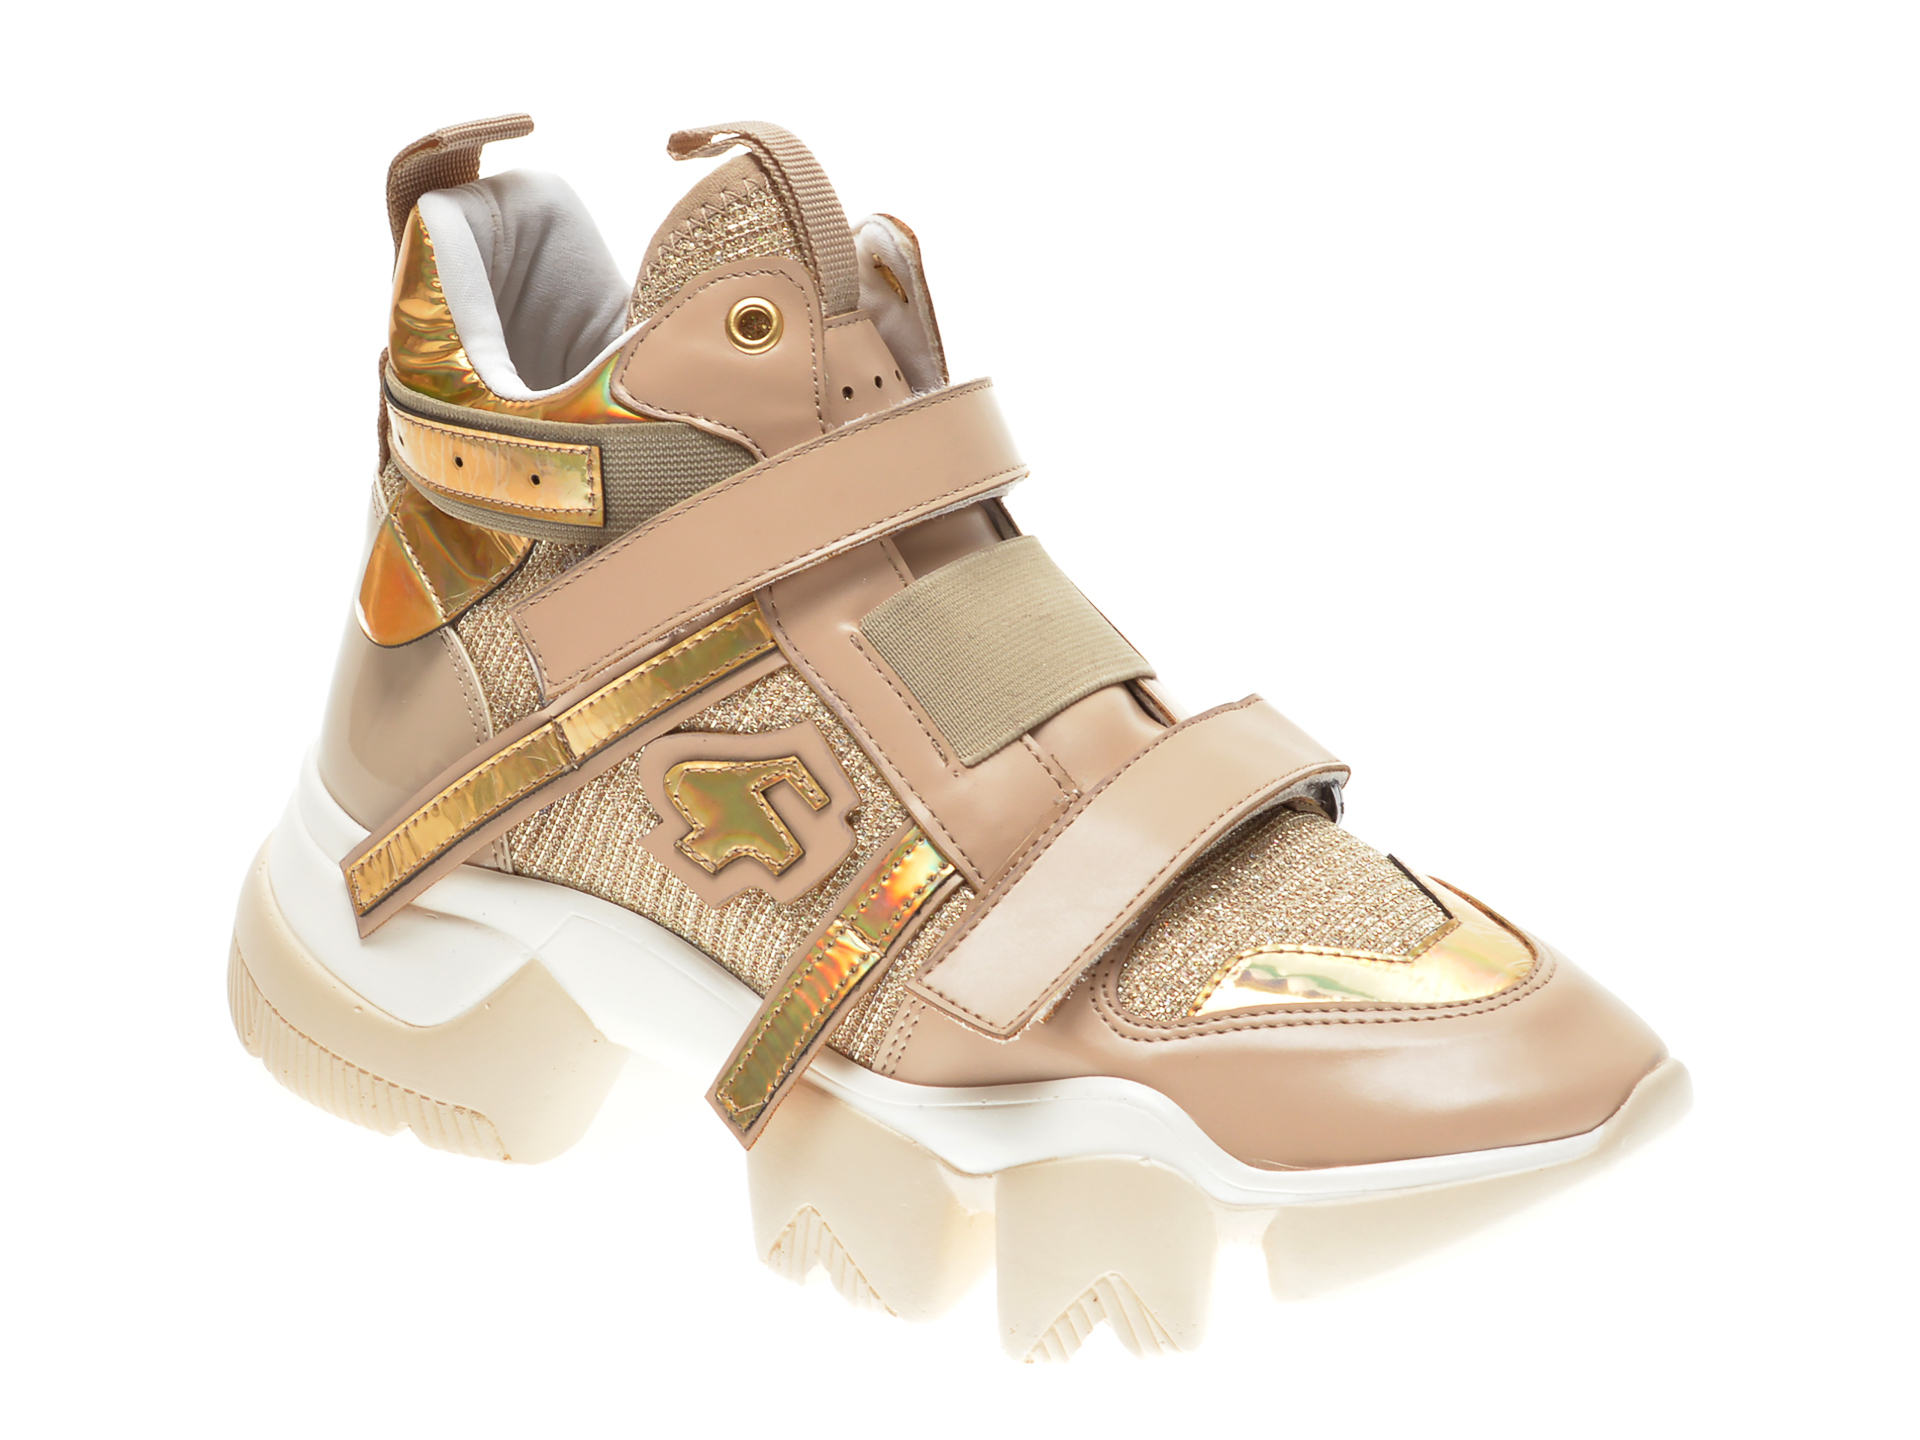 Pantofi sport GRYXX bej, MO99B51, din material textil si piele ecologica New